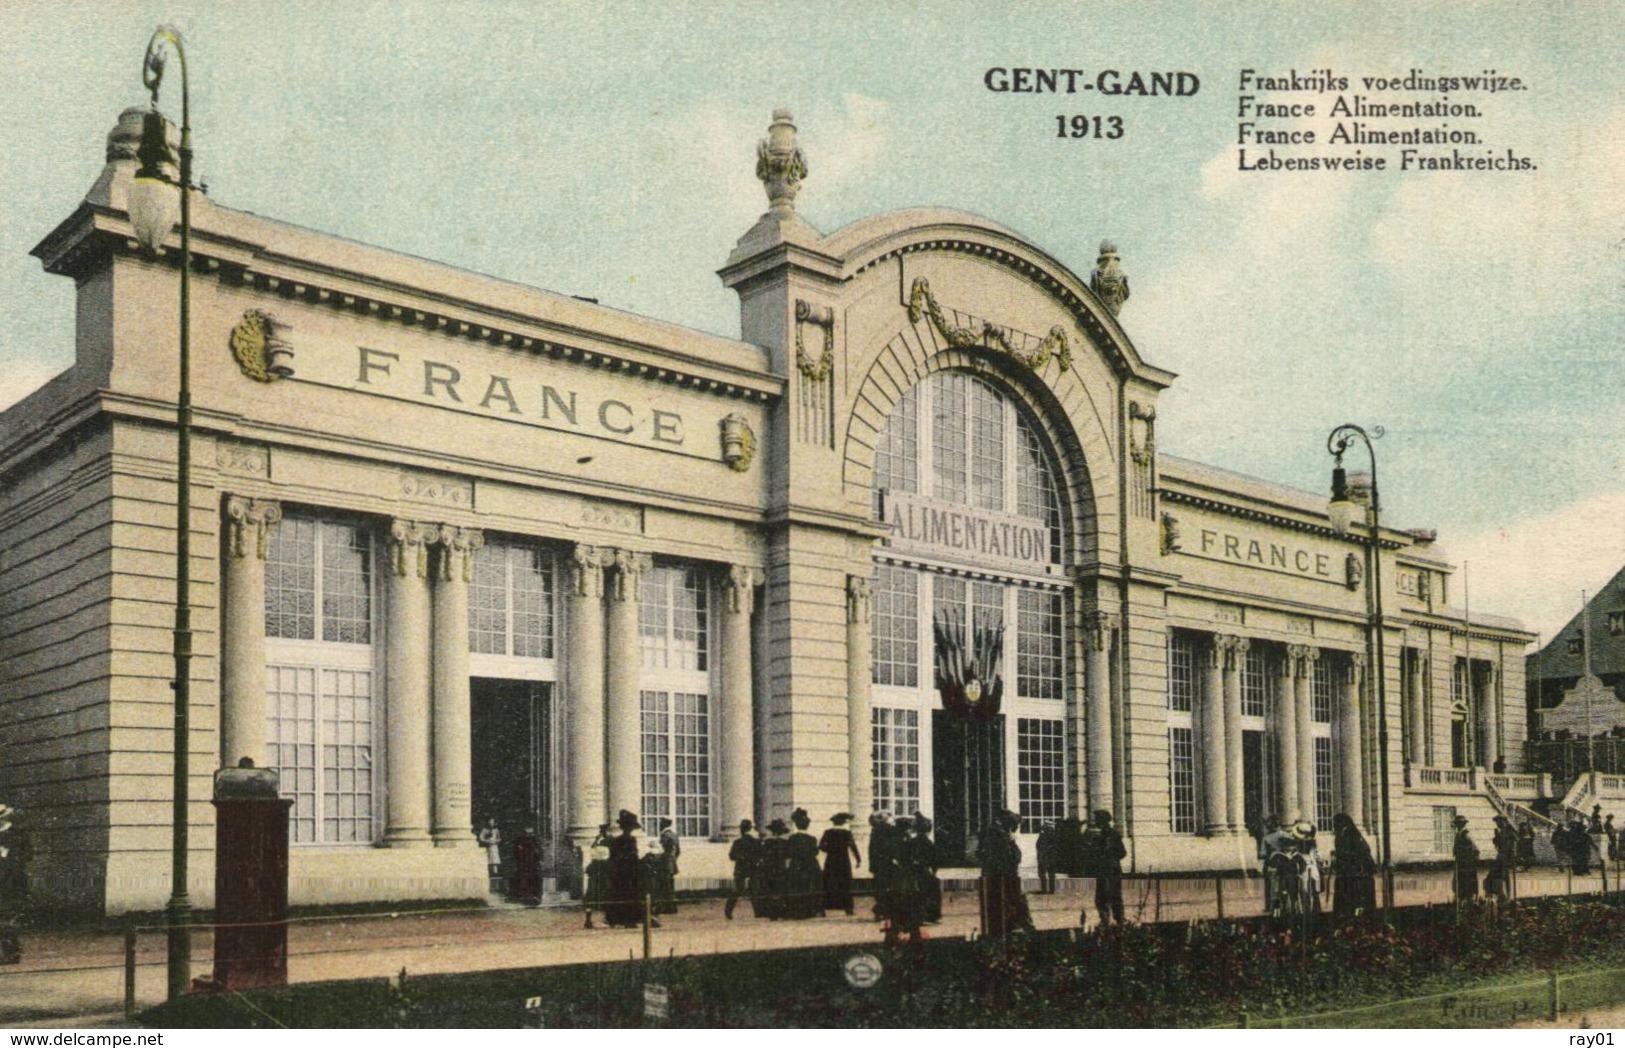 BELGIQUE - FLANDRE ORIENTALE - GENT - GAND - 1913 - France Alimentation - Frankrijks Voedingswijze. - Expositions